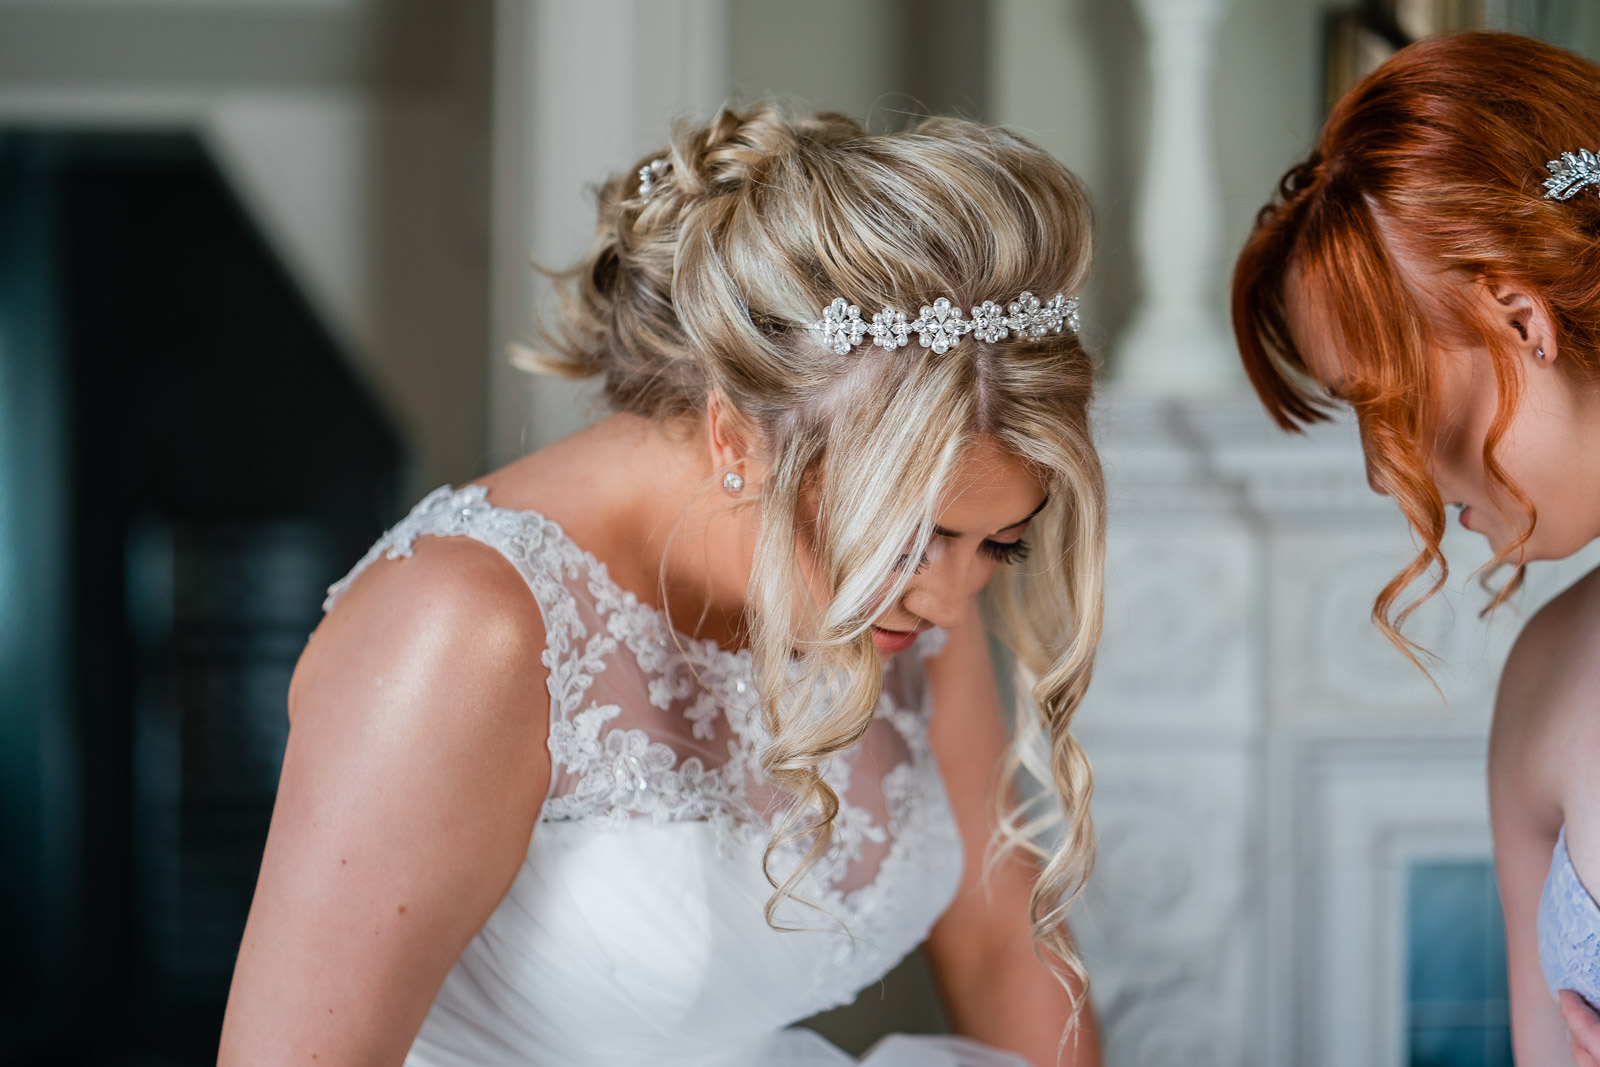 cornhill_castle_wedding_biggar_dearlyphotography (40 of 448).jpg